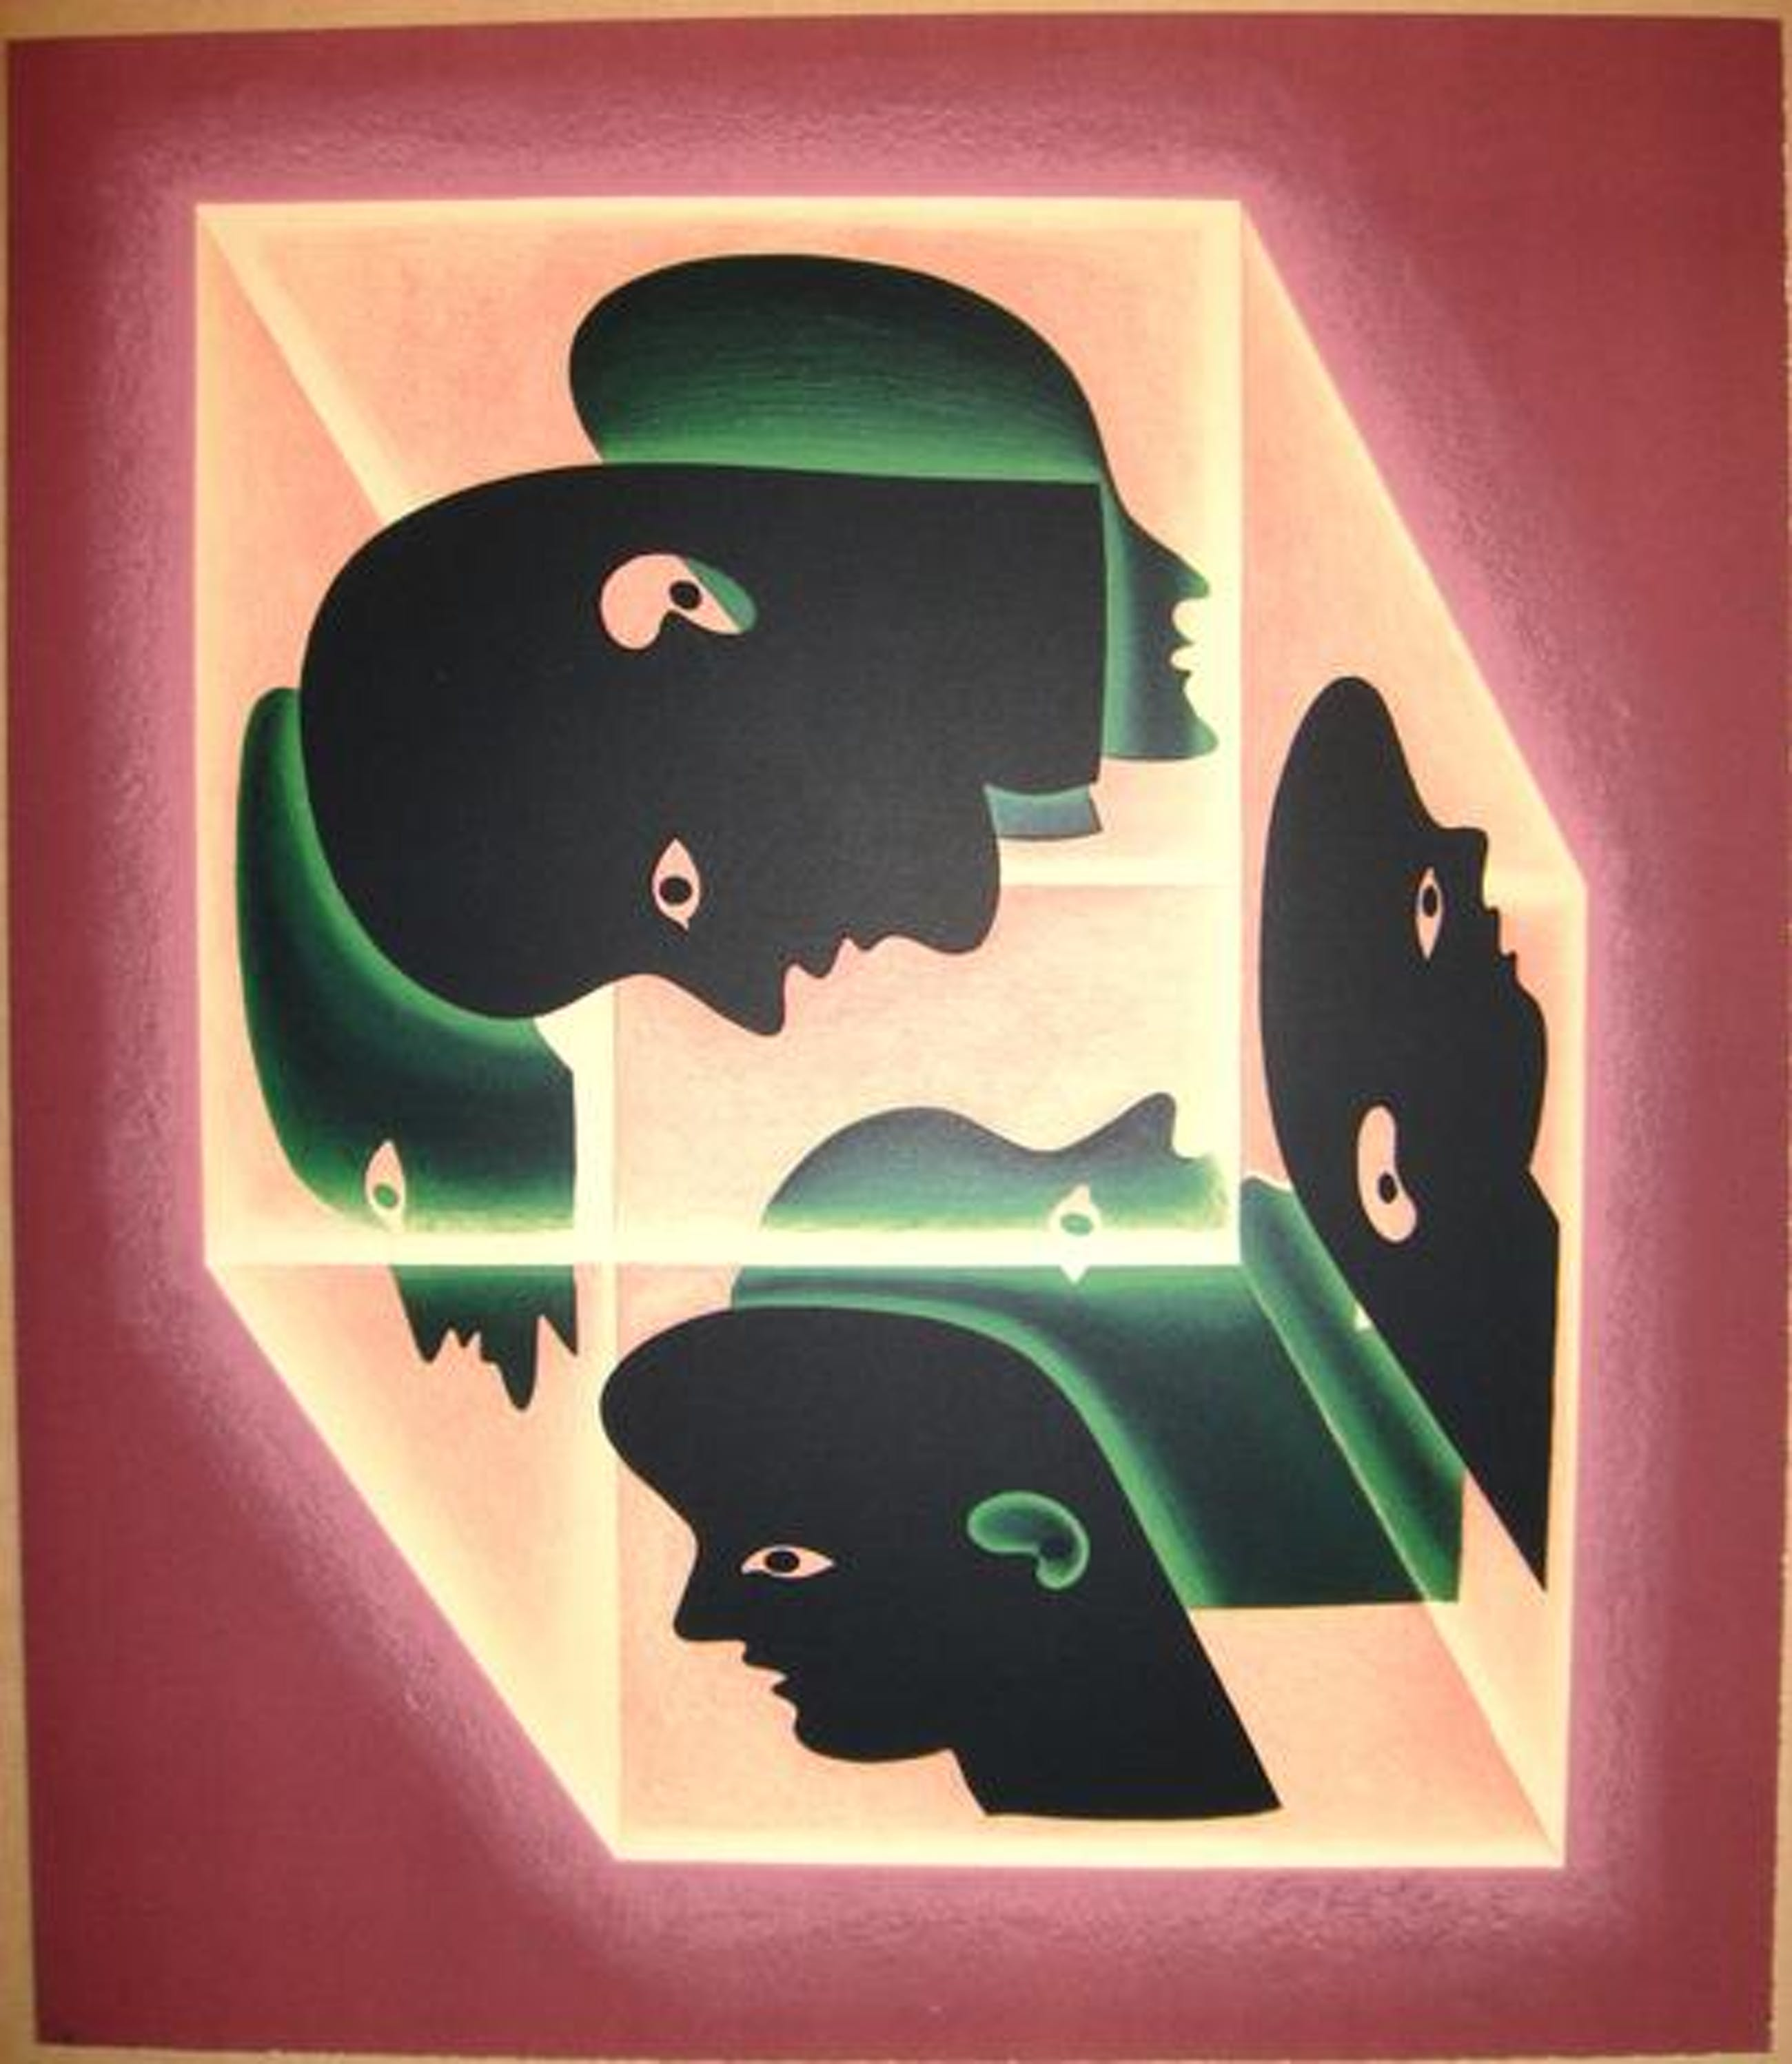 Victor Vasarely - Originale handsignierte Farbserigrafie - Auflage von nur 7 Exemplaren kopen? Bied vanaf 590!